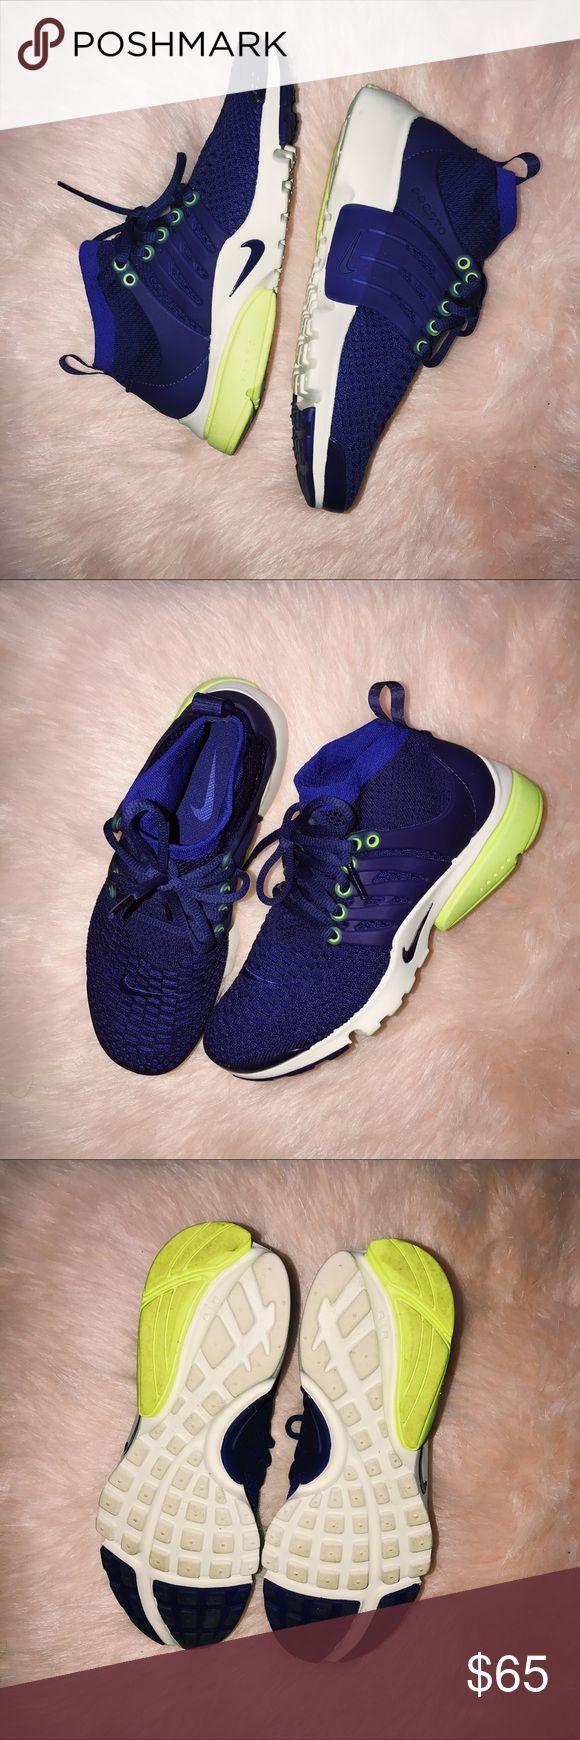 Nike Air Presto Flyknit Ultra, Sz 6 Nike Air Presto Flyknit Ultra in Deep Royal Blue women's shoes - great condition. /// #nike #vans #fashion #sneakers #shoes #converse #puma #adidasoriginals #newbalance #gucci #fitness #airmax #nikeairmax #adidassuperstar #supreme  #ootd #superstar #sport Nike Shoes Sneakers